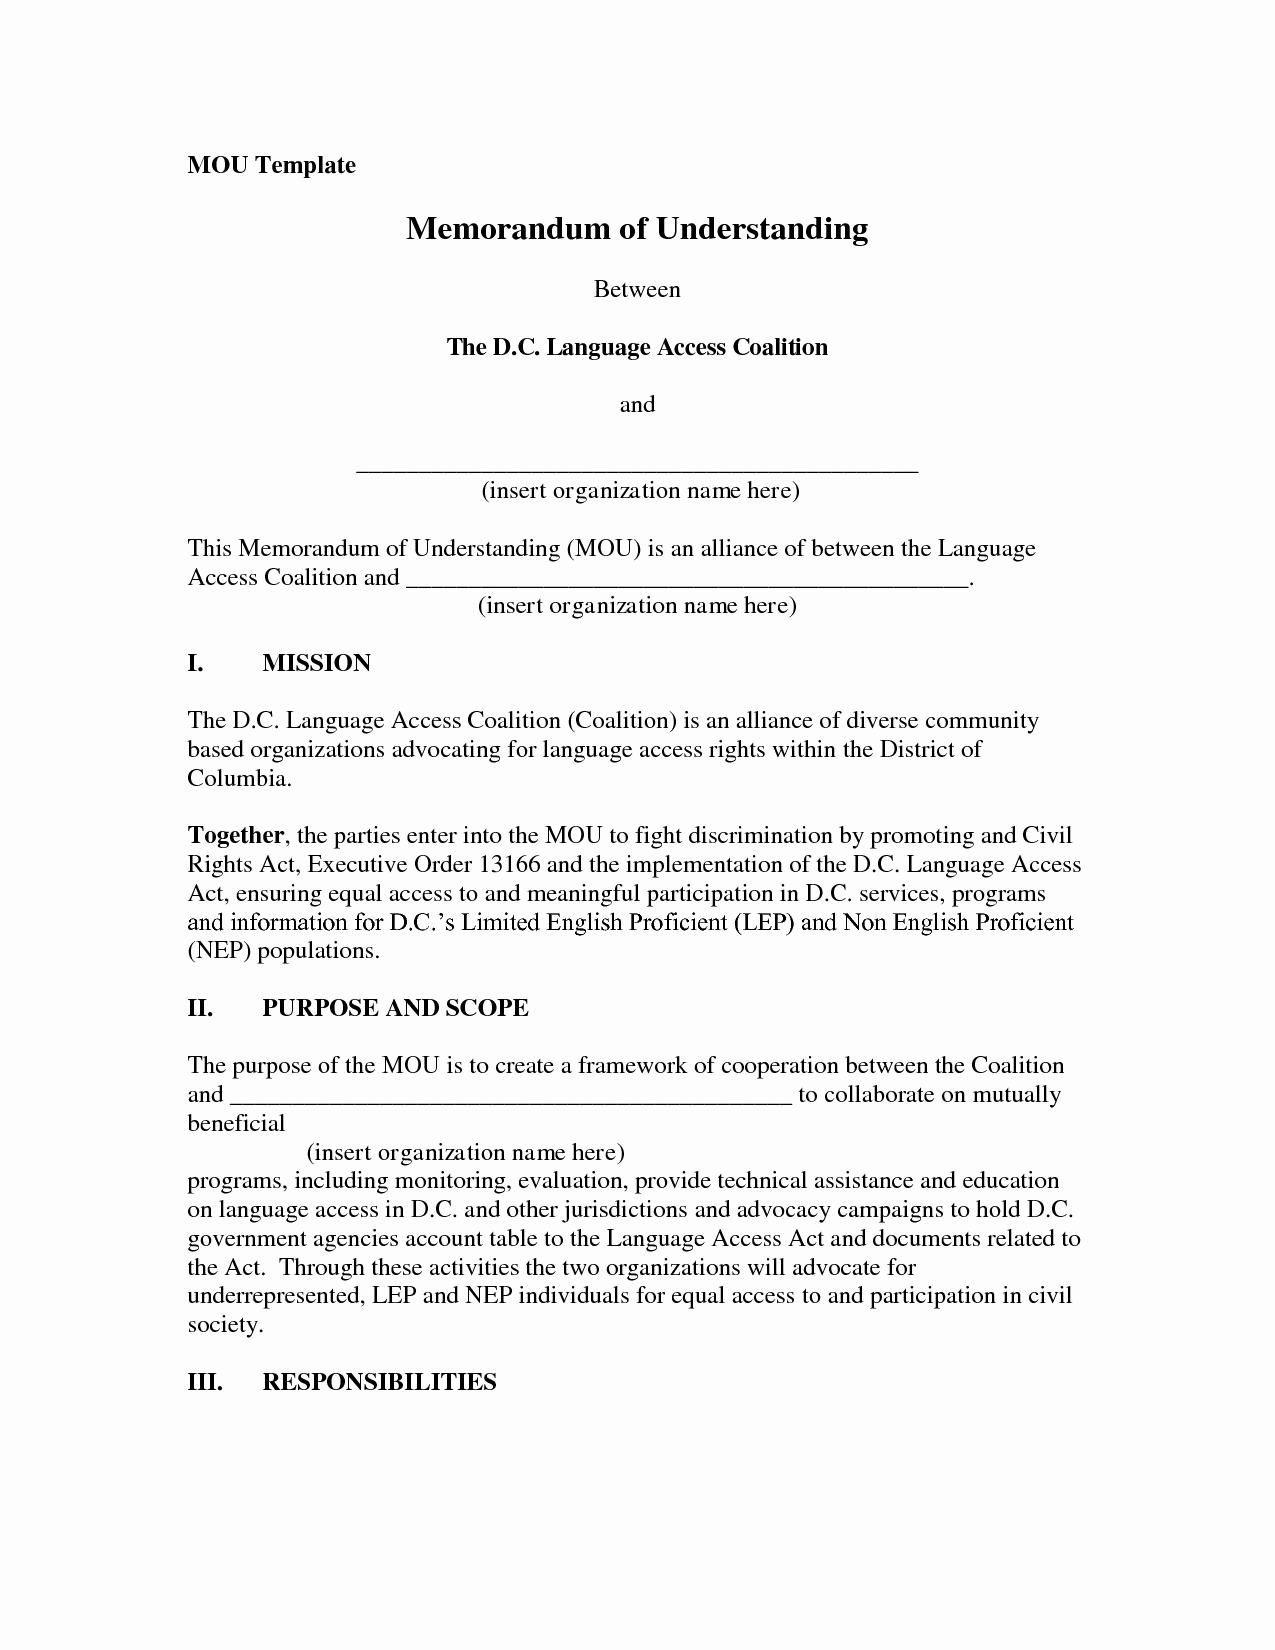 Memorandum Of Agreement Template Elegant Dozerausm Memorandum Of Understanding Template form